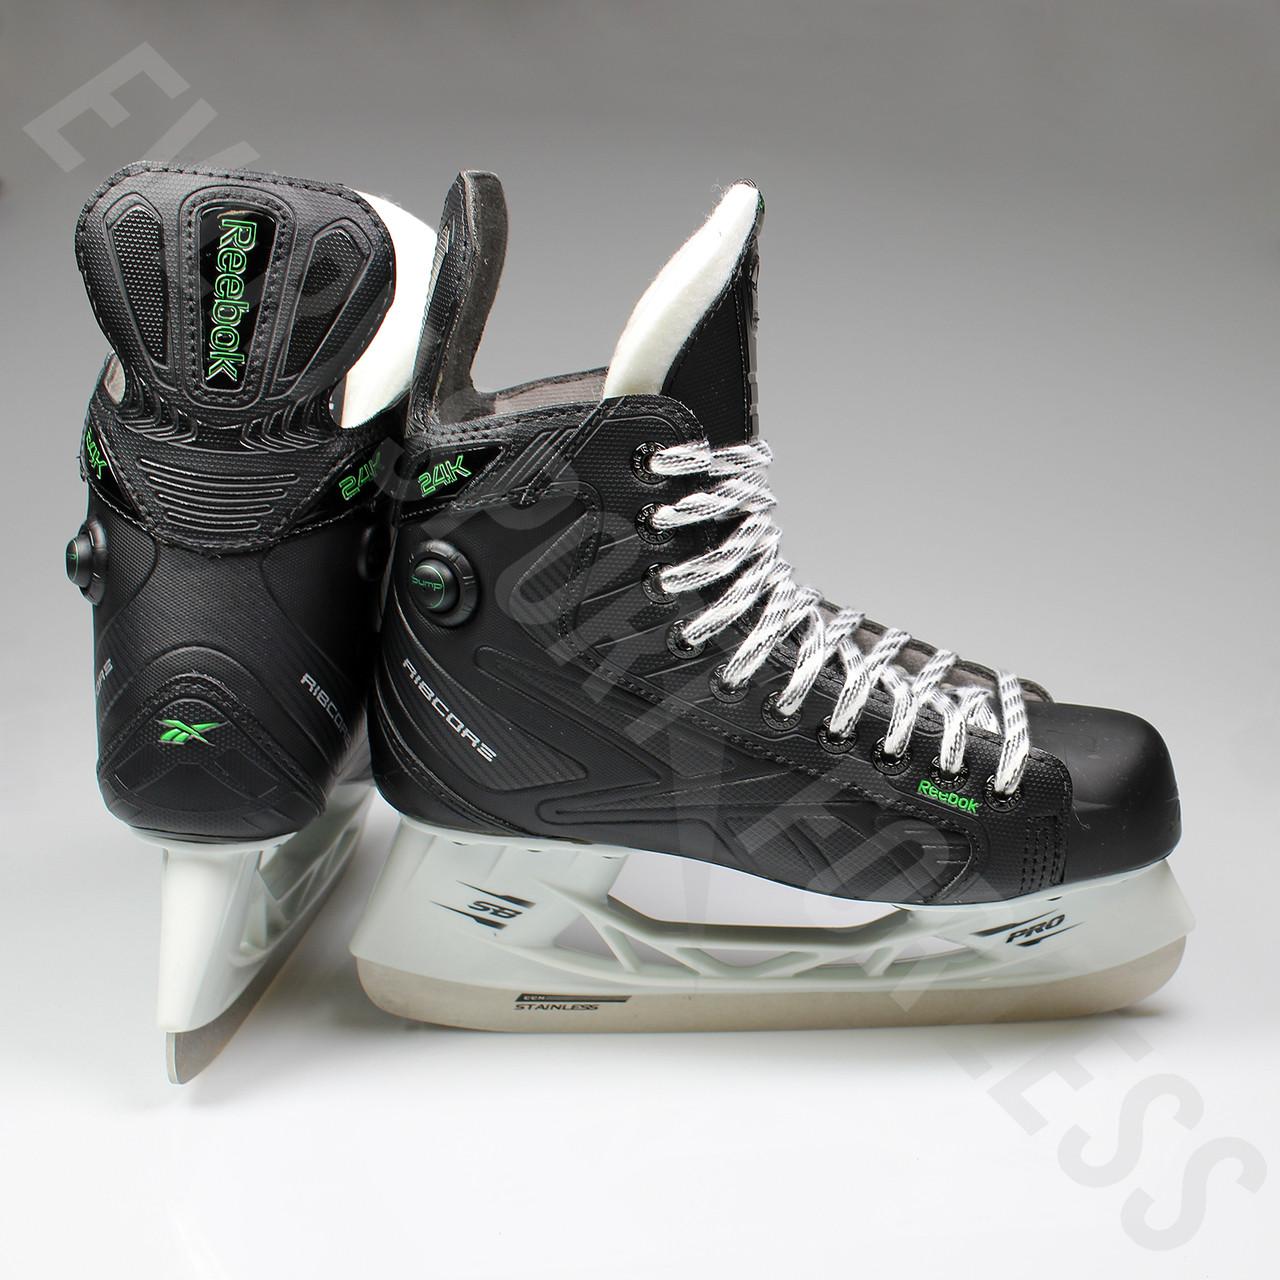 reebok ice skates reebok ribcor 24k pump junior ice hockey skates o